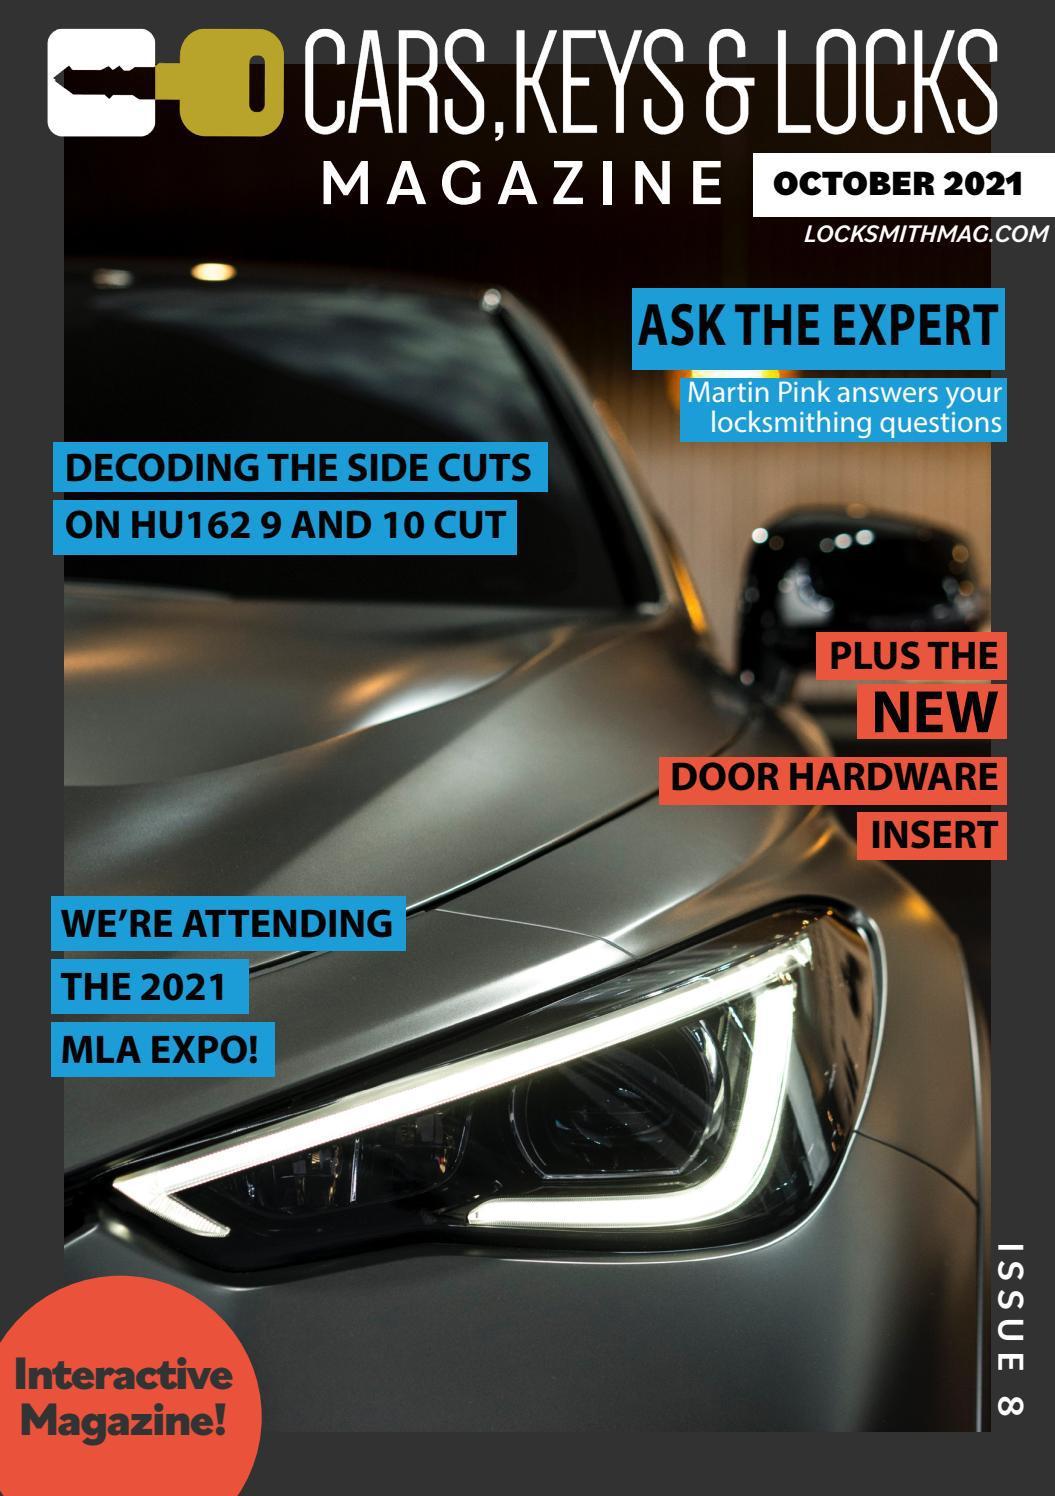 Cars, Keys and Locks Magazine | Issue 8 | October 2021